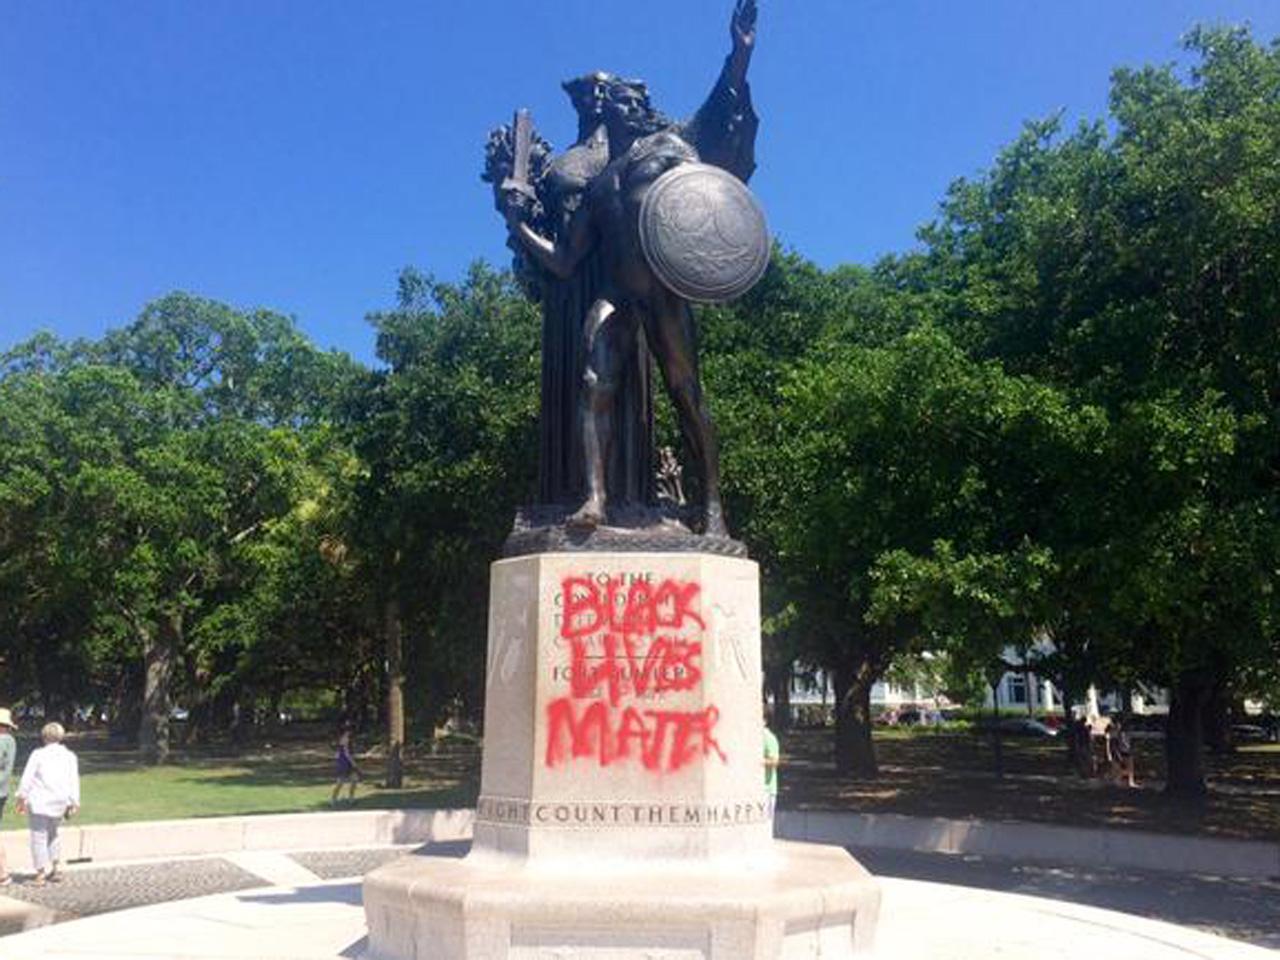 Confederate Statue Vandalism (Credit: CBS News)